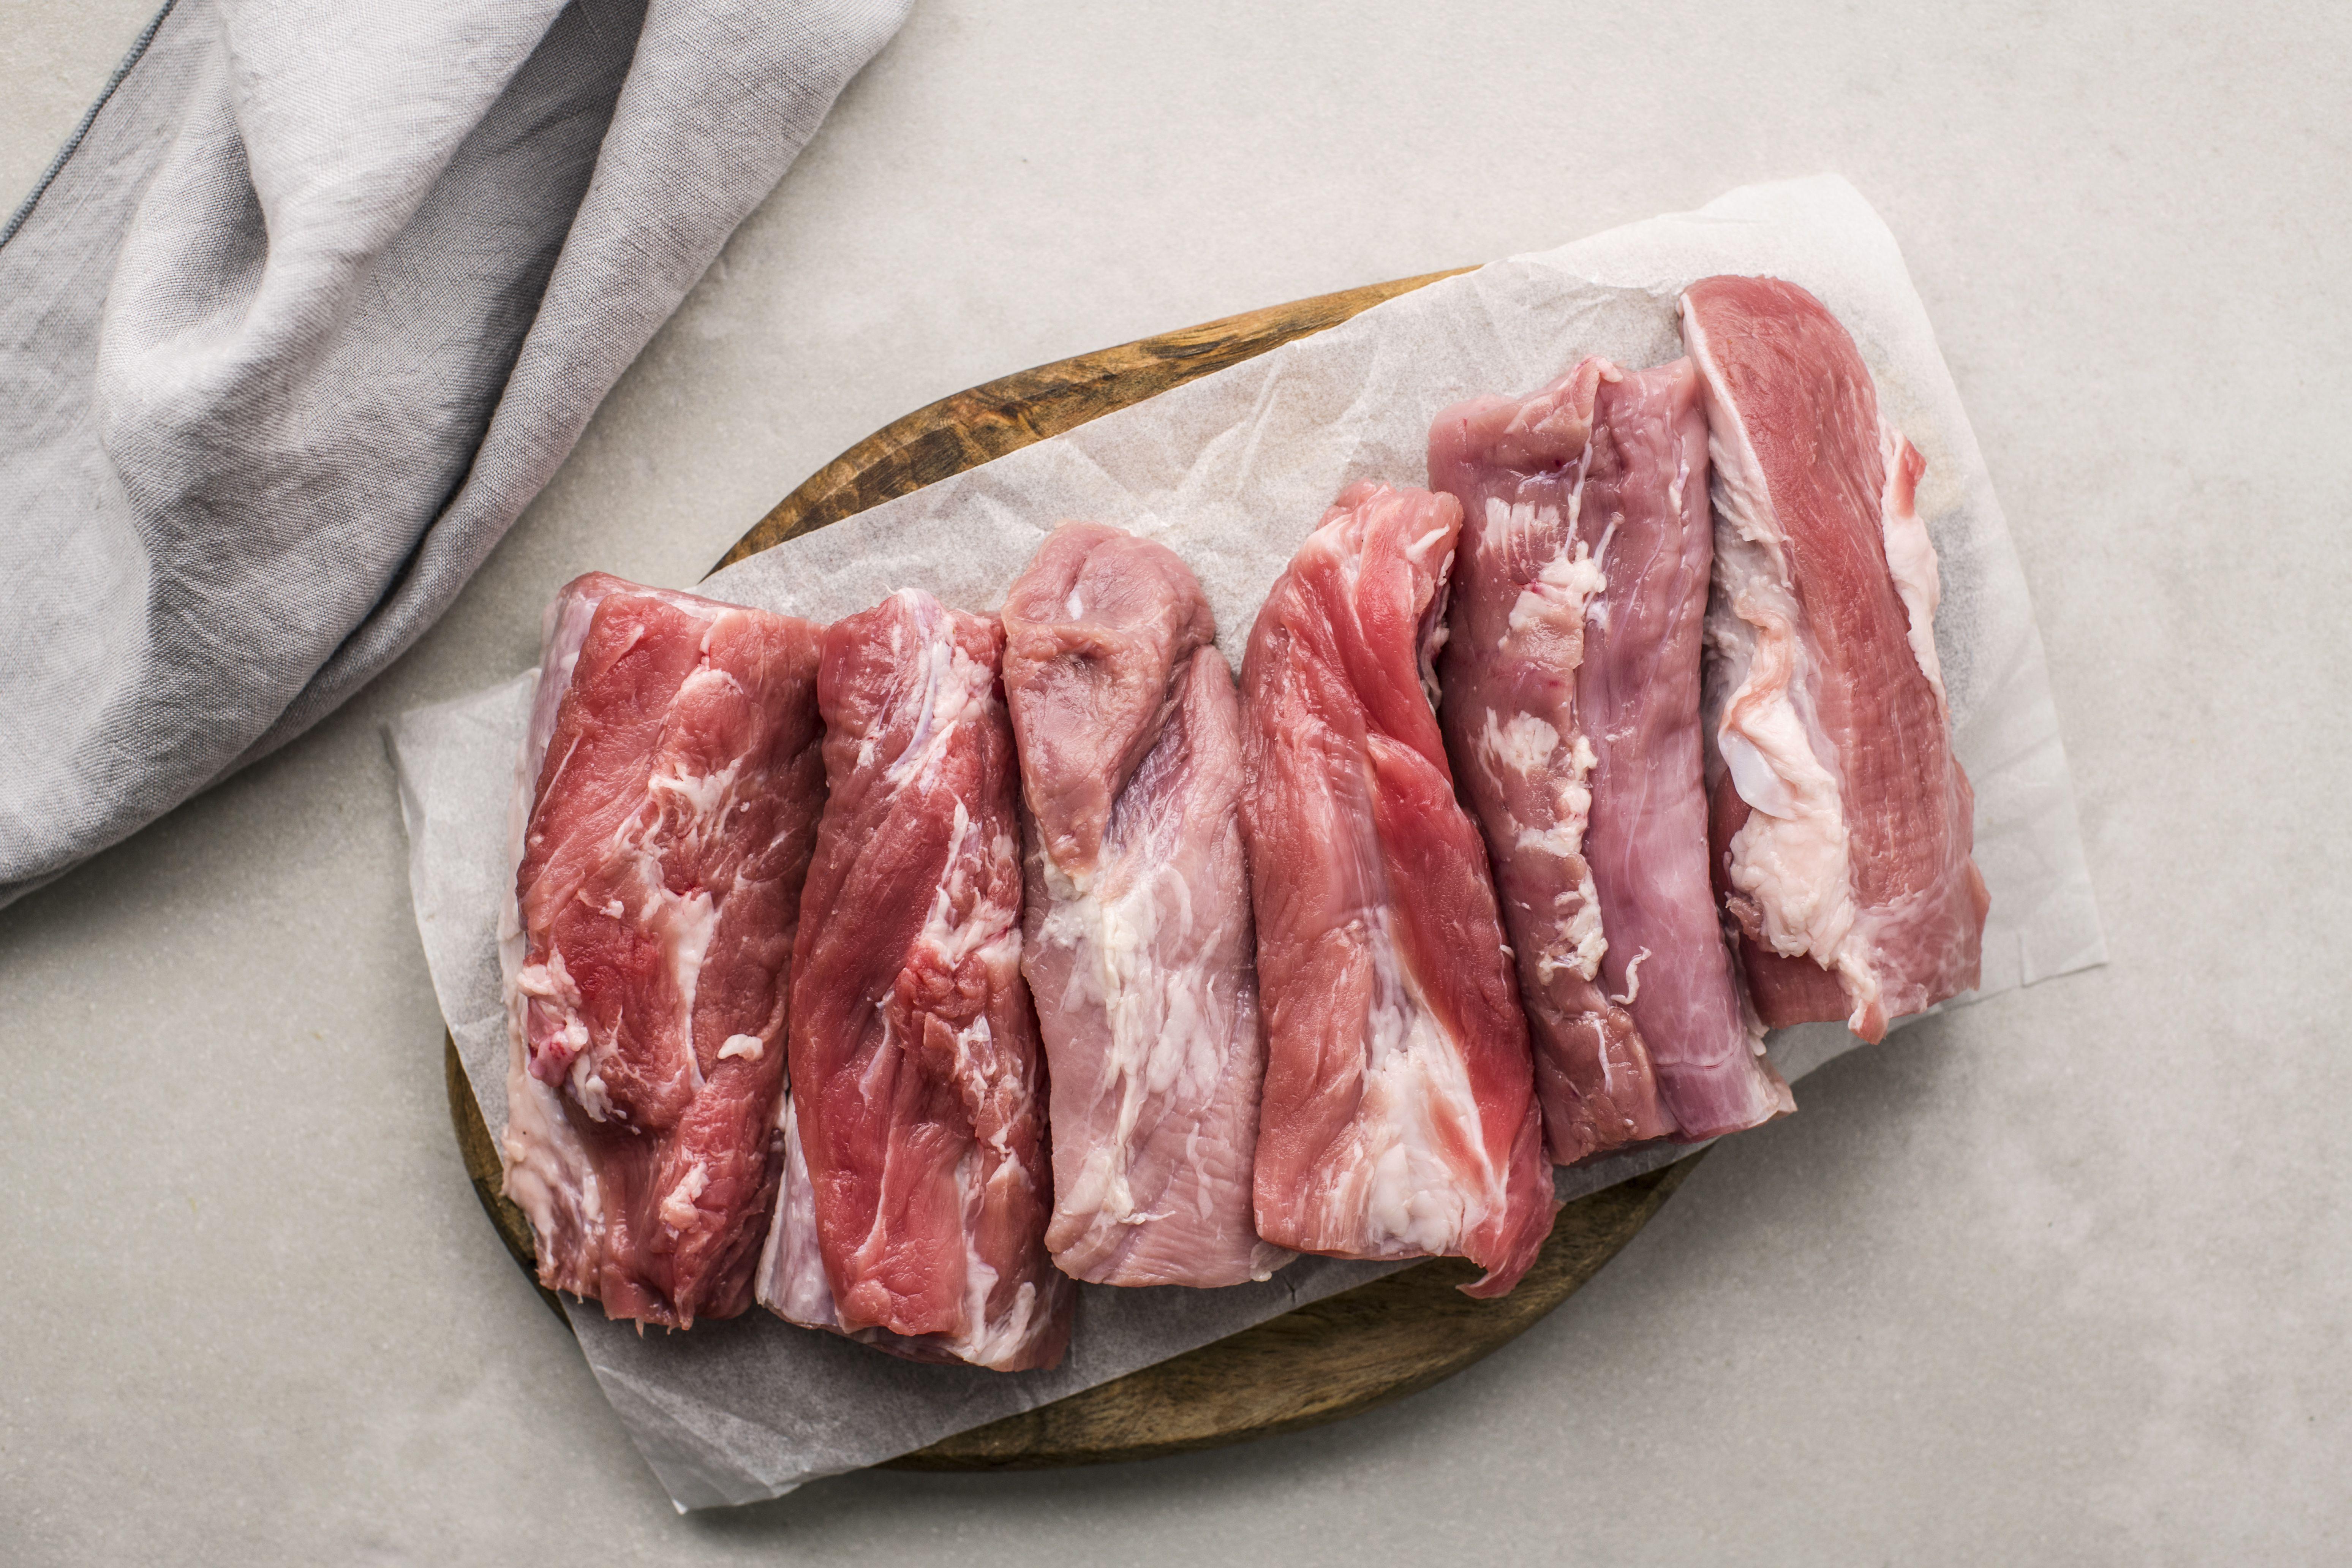 Cut the pork into strips